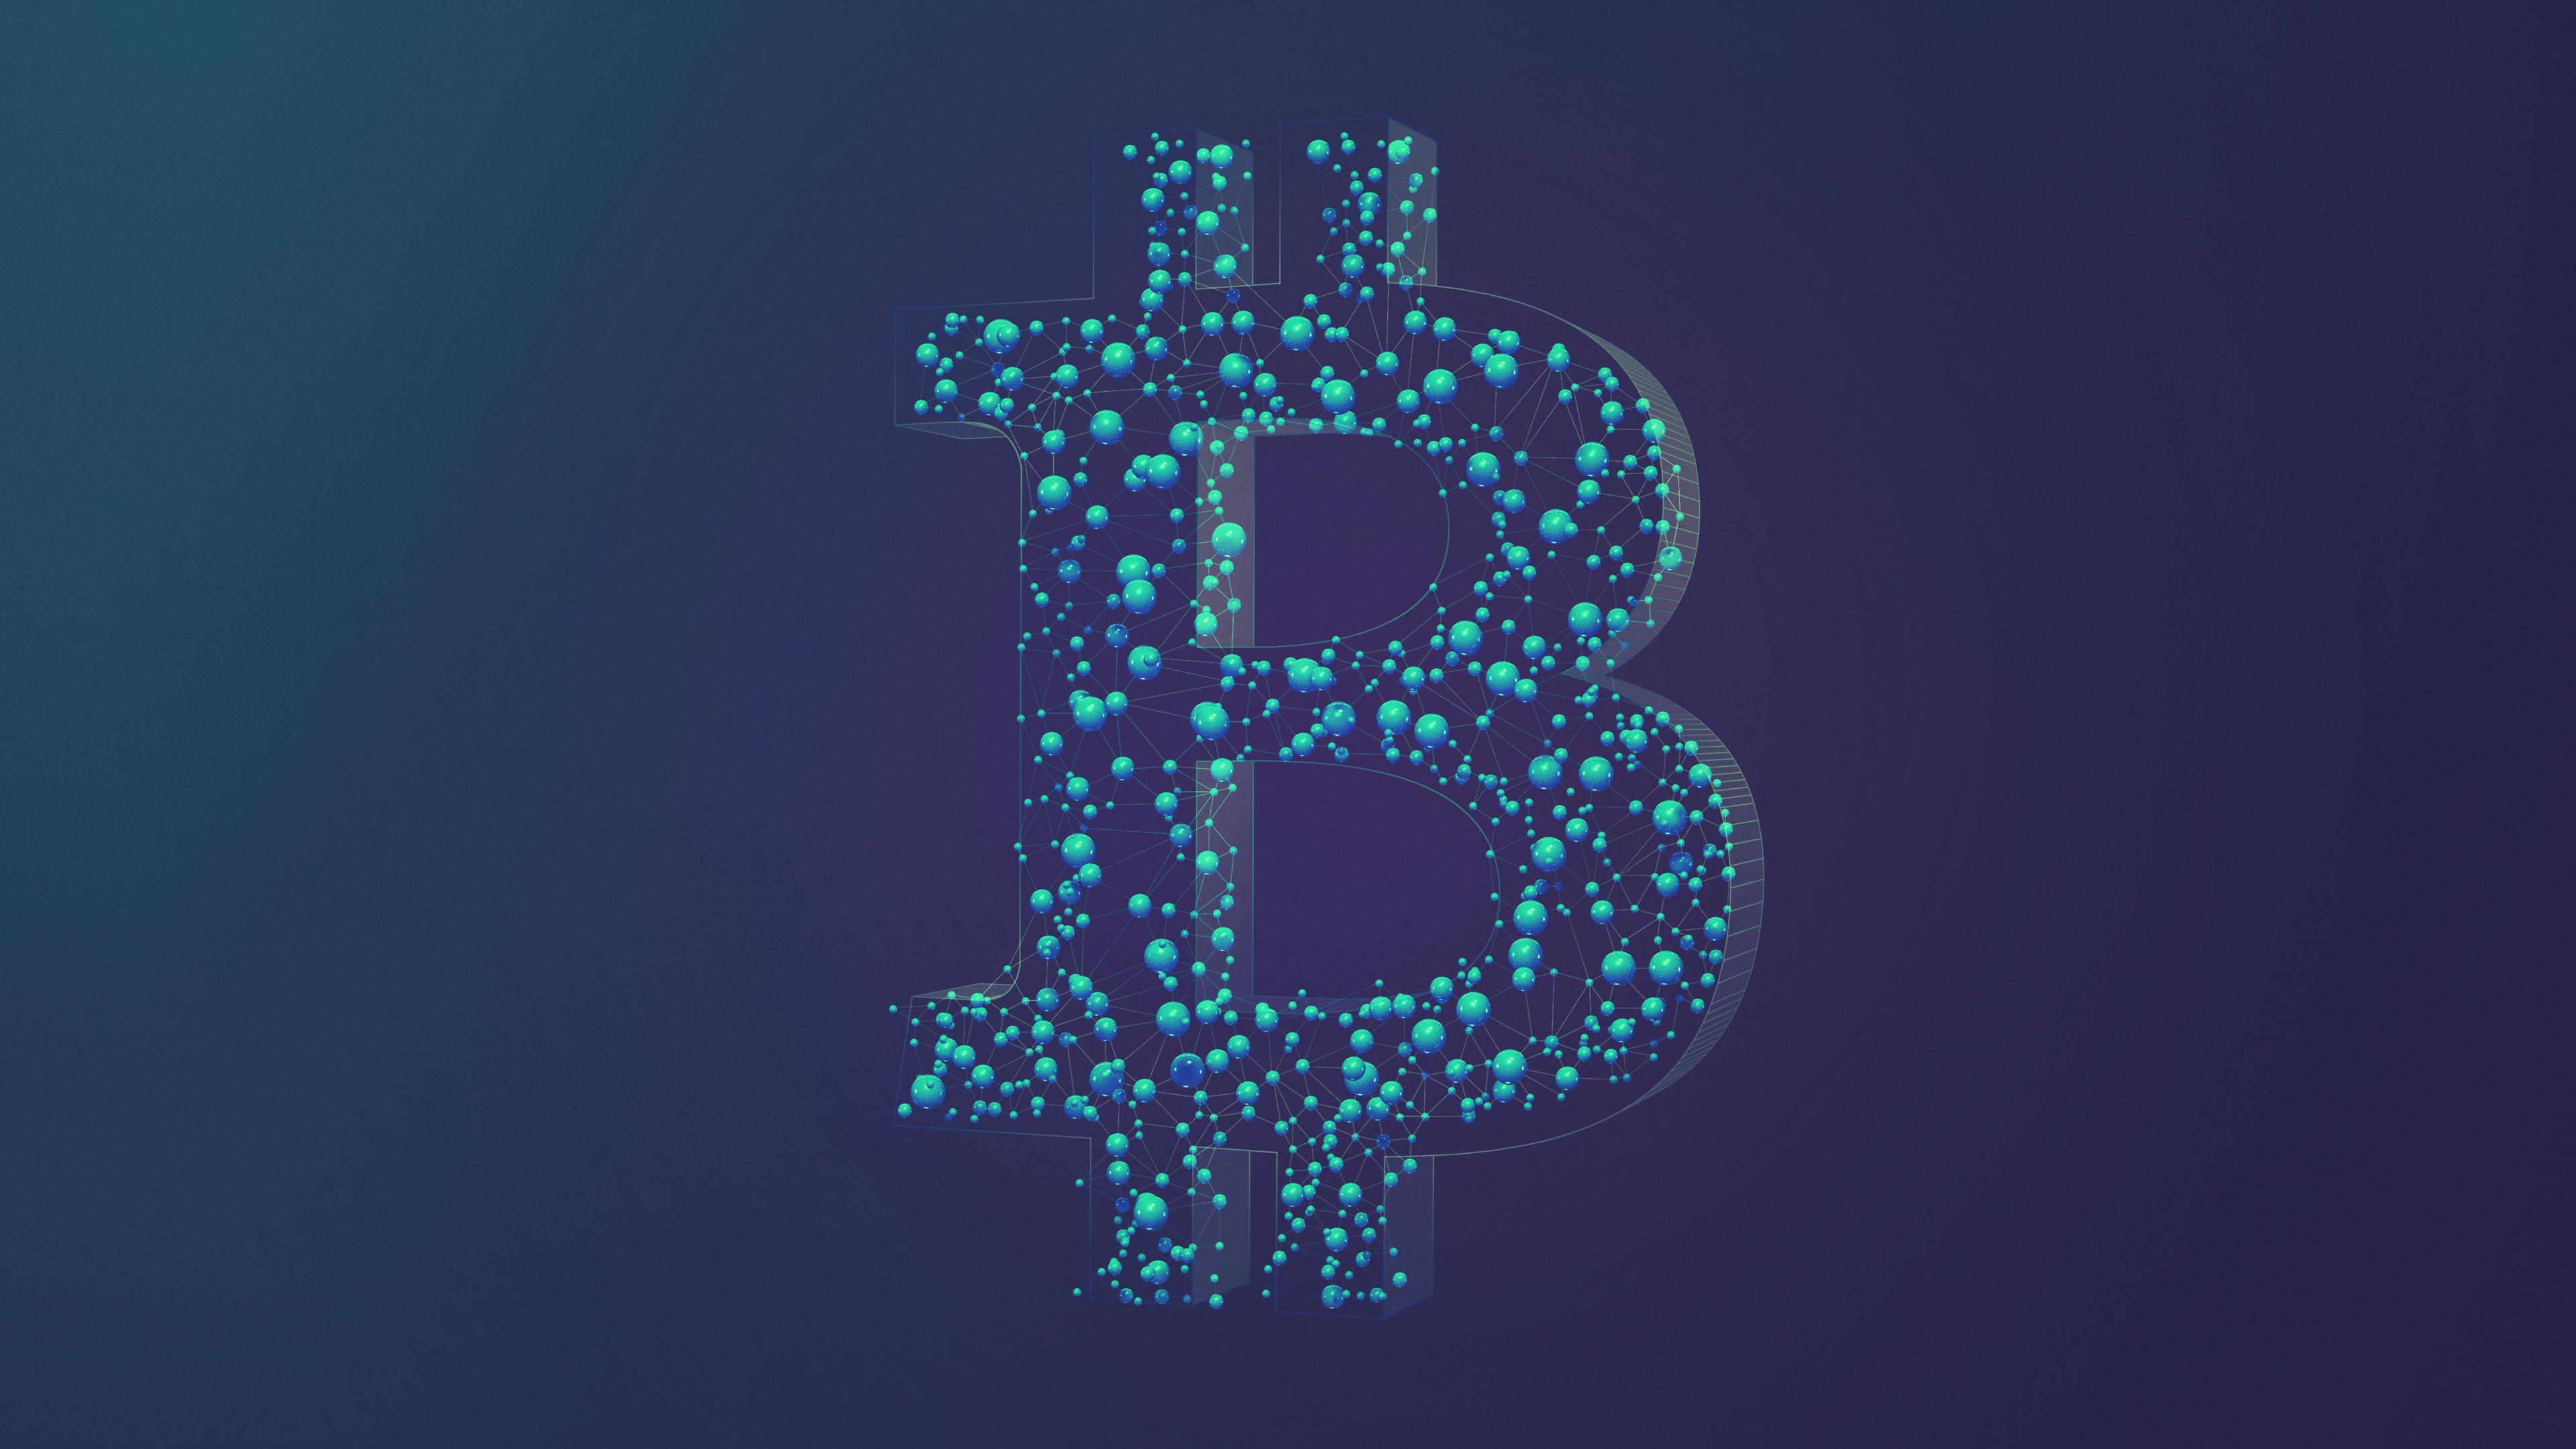 Bitcoin In Wikipedia >> File:Bitcoin Network Blue 4k.jpg - Wikimedia Commons